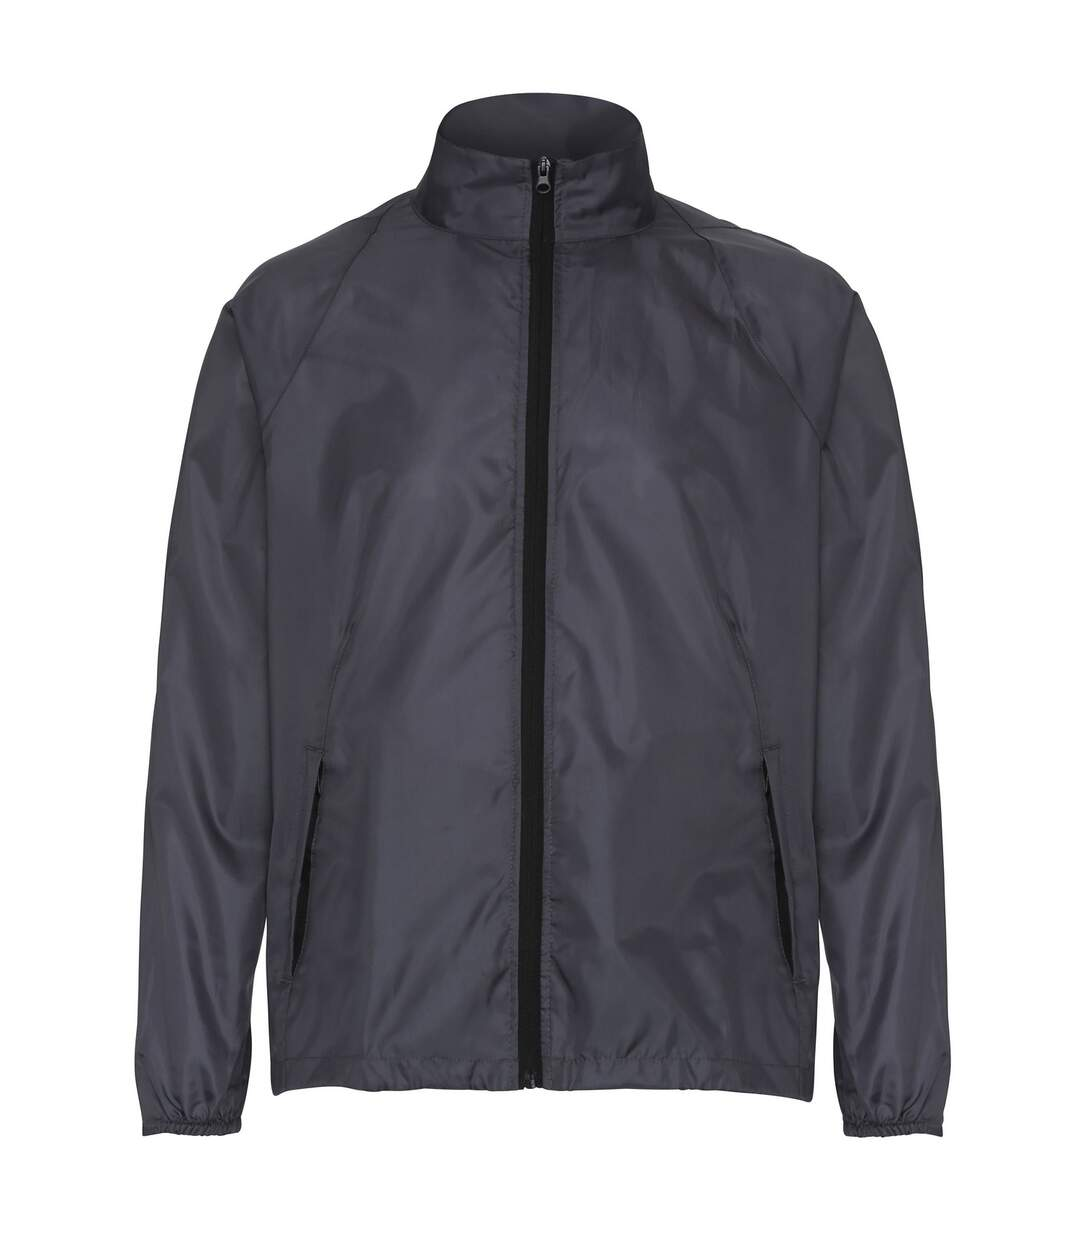 2786 Mens Contrast Lightweight Windcheater Shower Proof Jacket (Orange/ Black) - UTRW2501